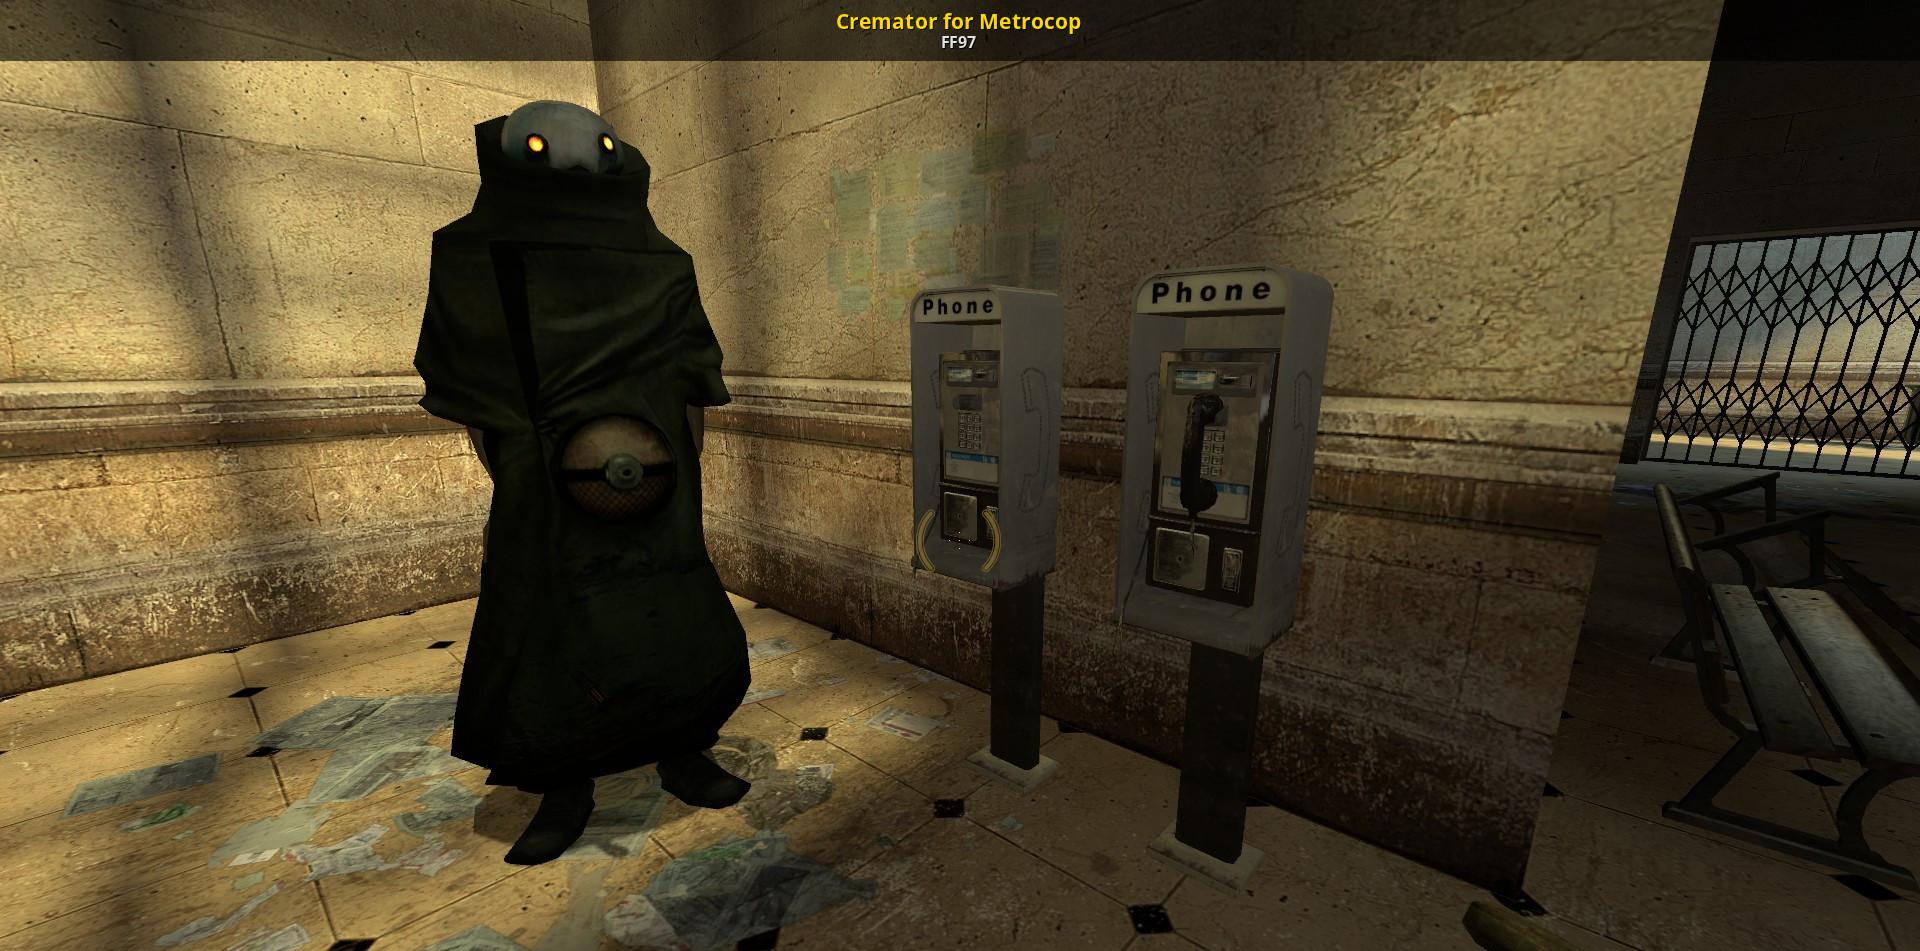 Half Life Cremator